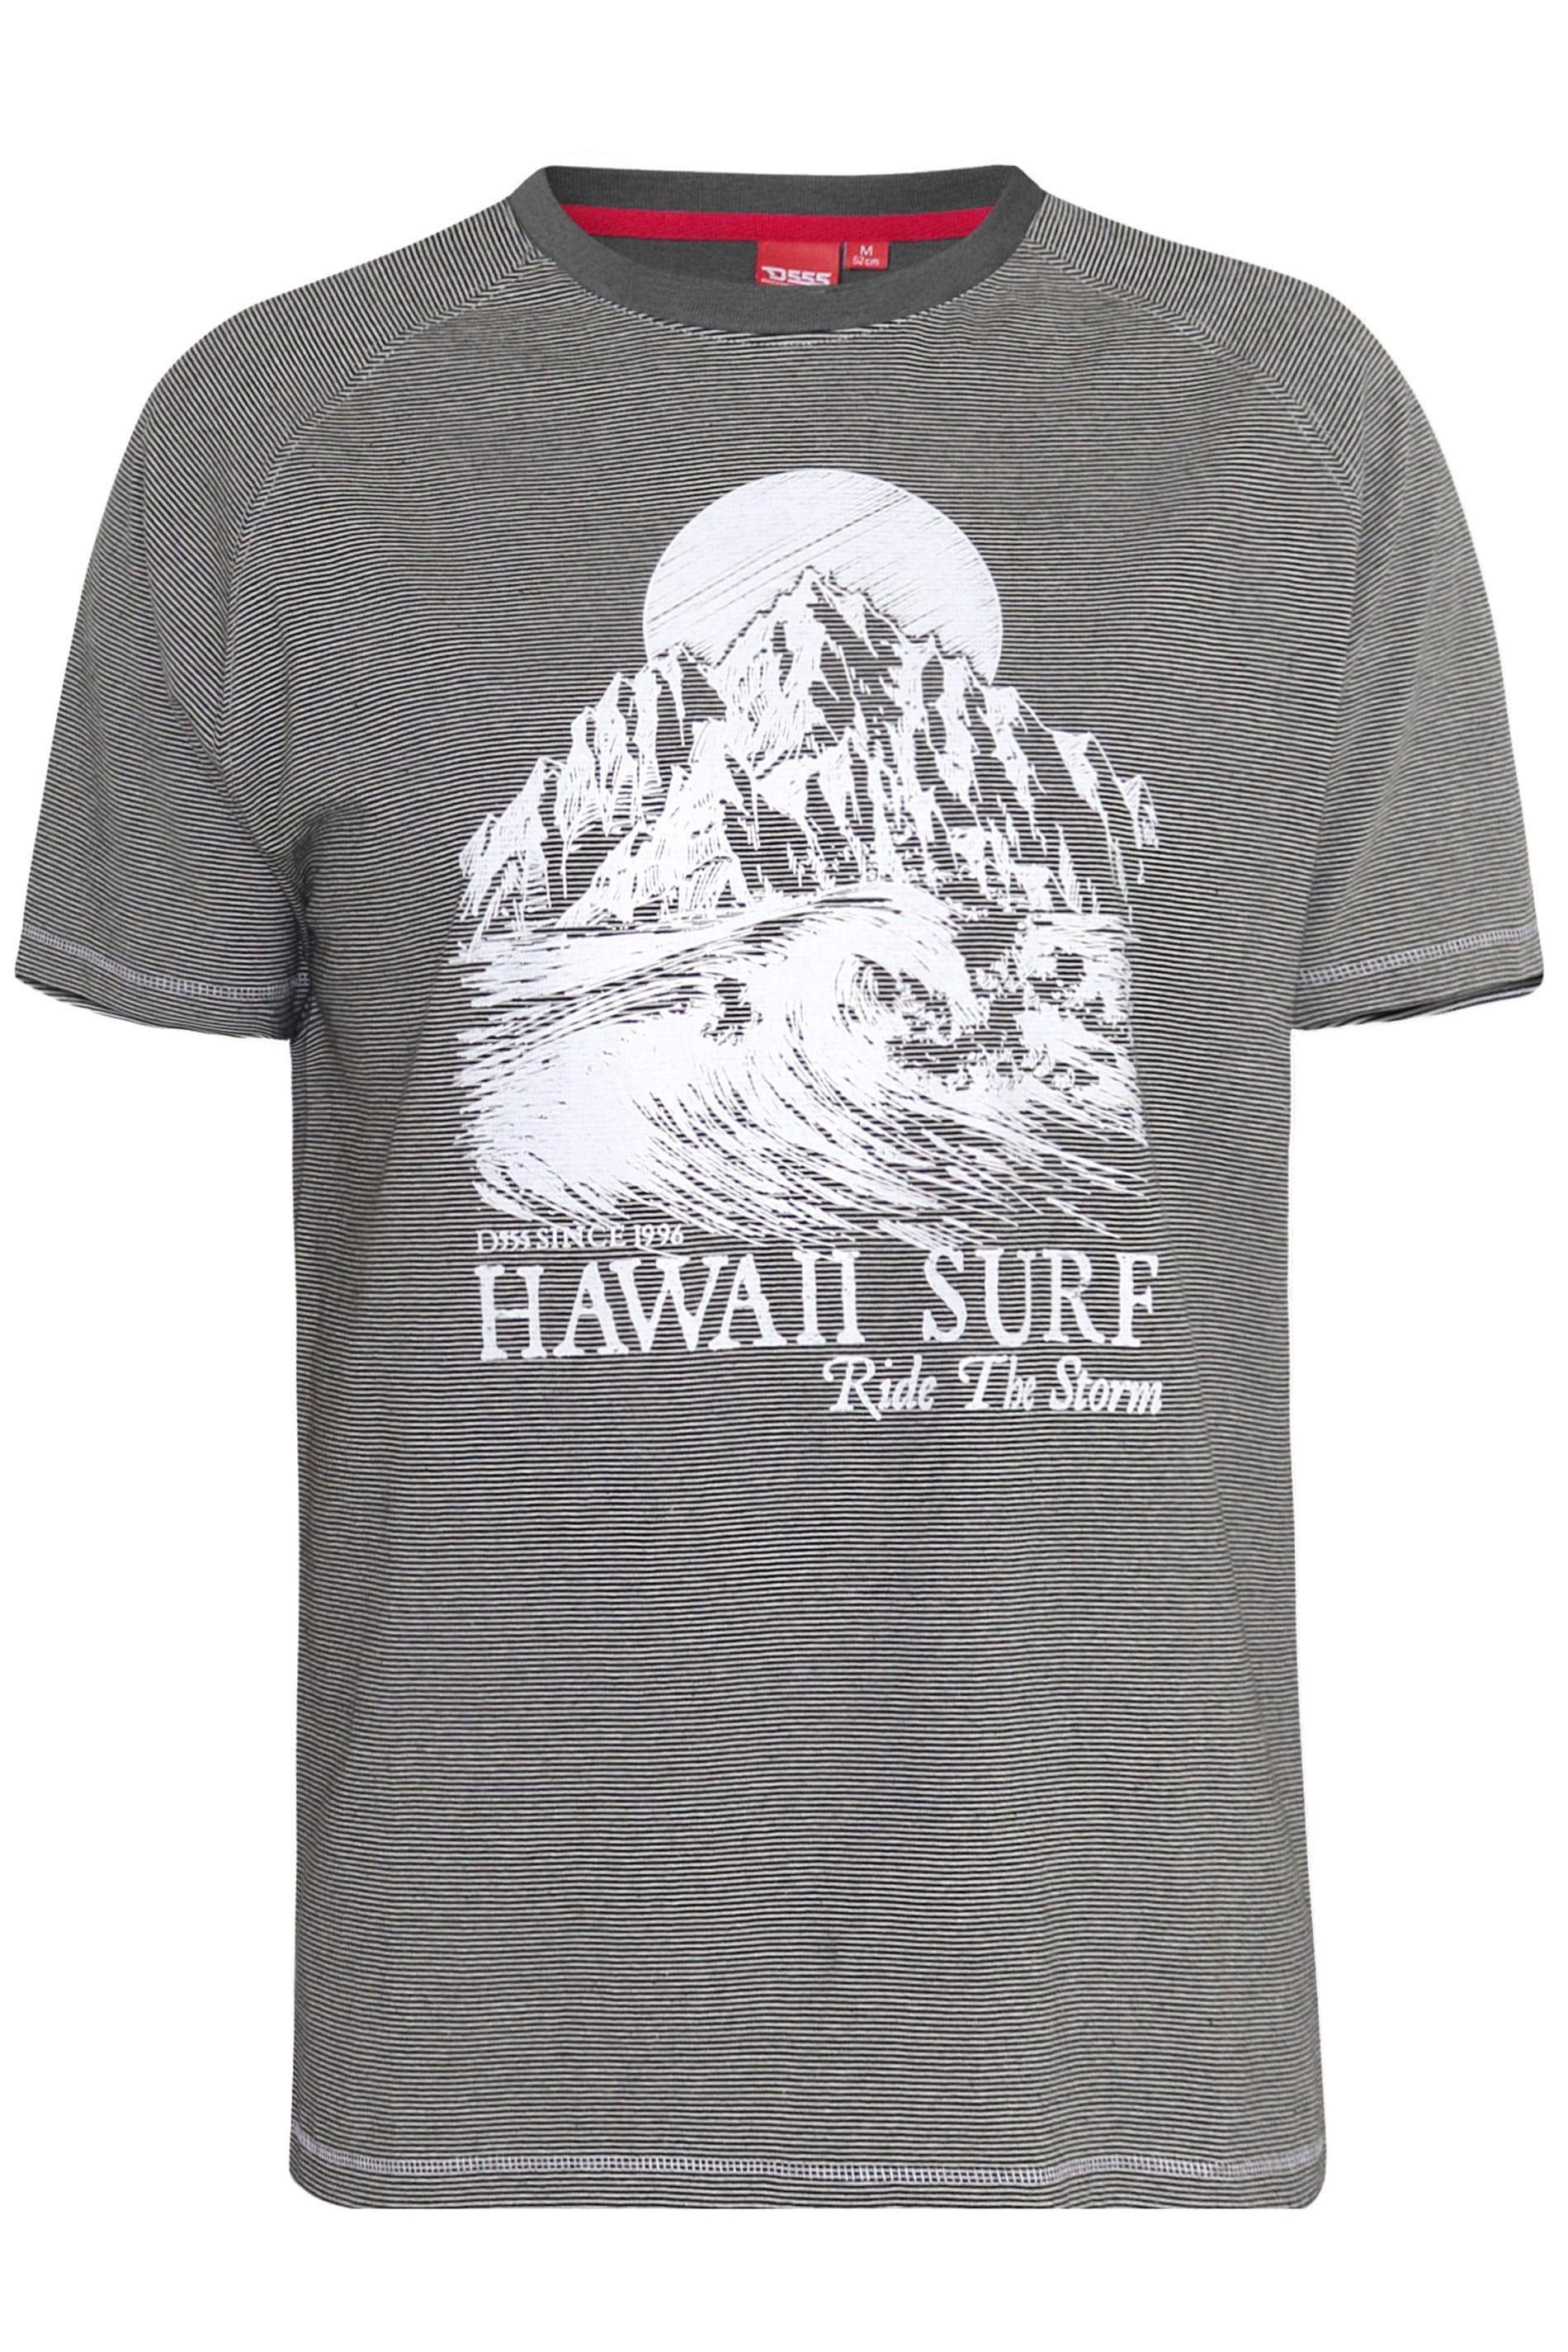 D555 Grey Fine Stripe Hawaii Graphic Print T-Shirt